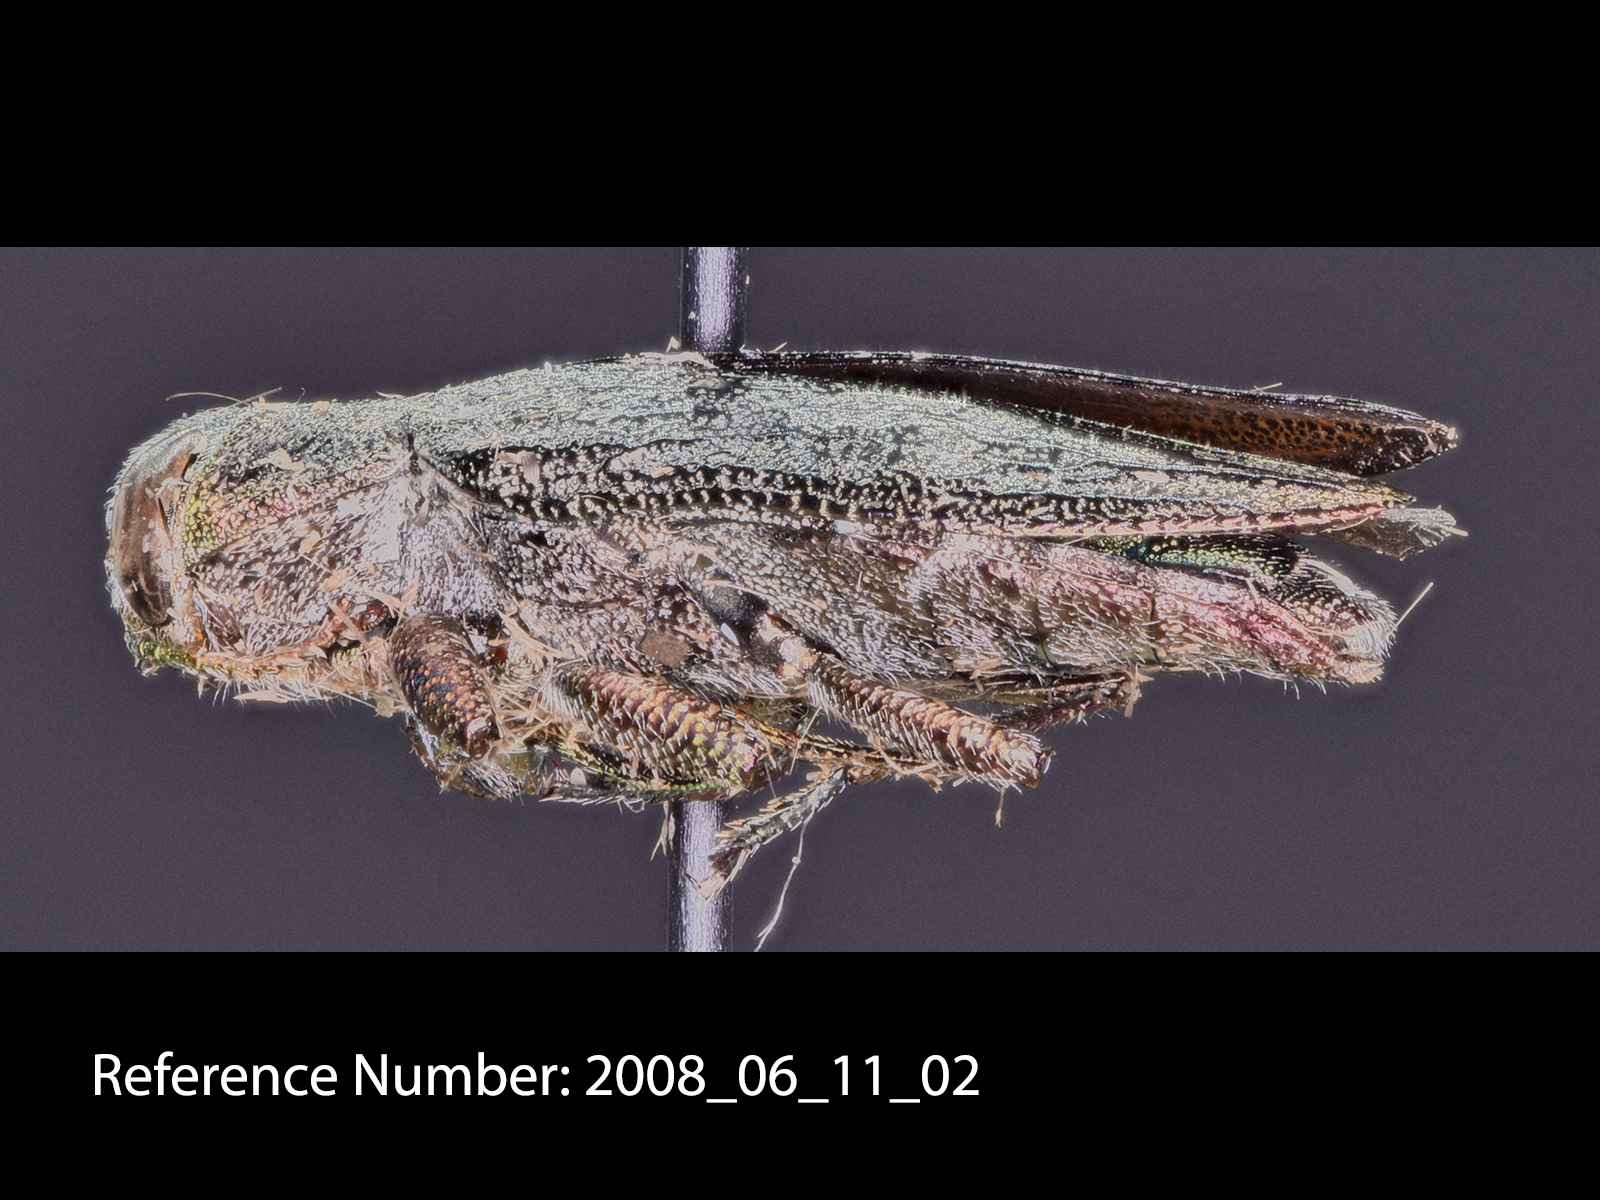 Chrysobothris femorata lateral view